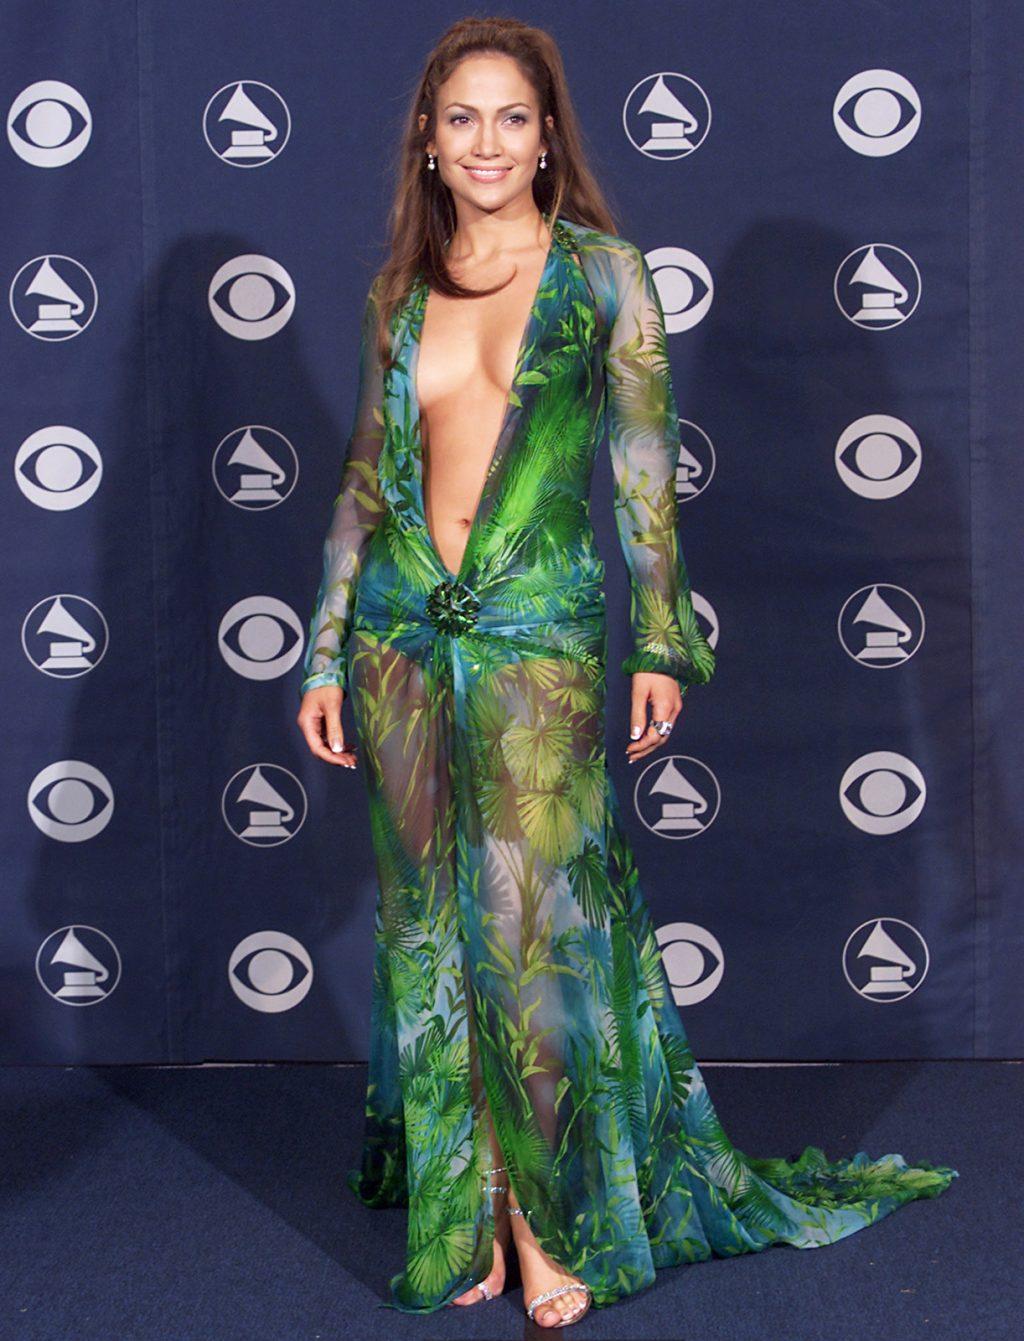 ca sĩ Jennifer Lopez trên trang bìa tạp chí Instyle 6